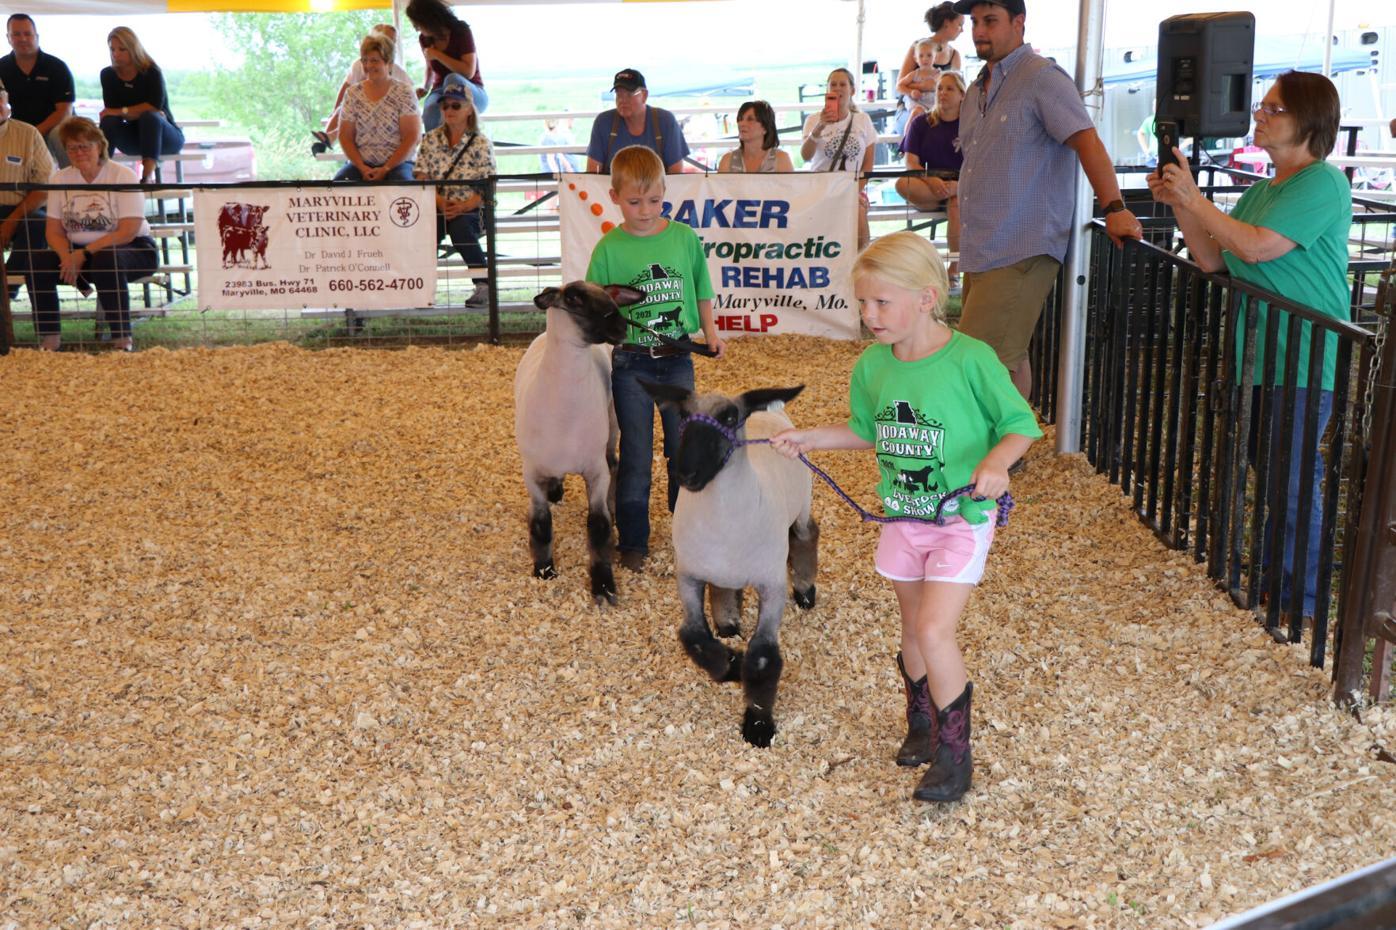 7-22-21 Sheep Show 1.jpg